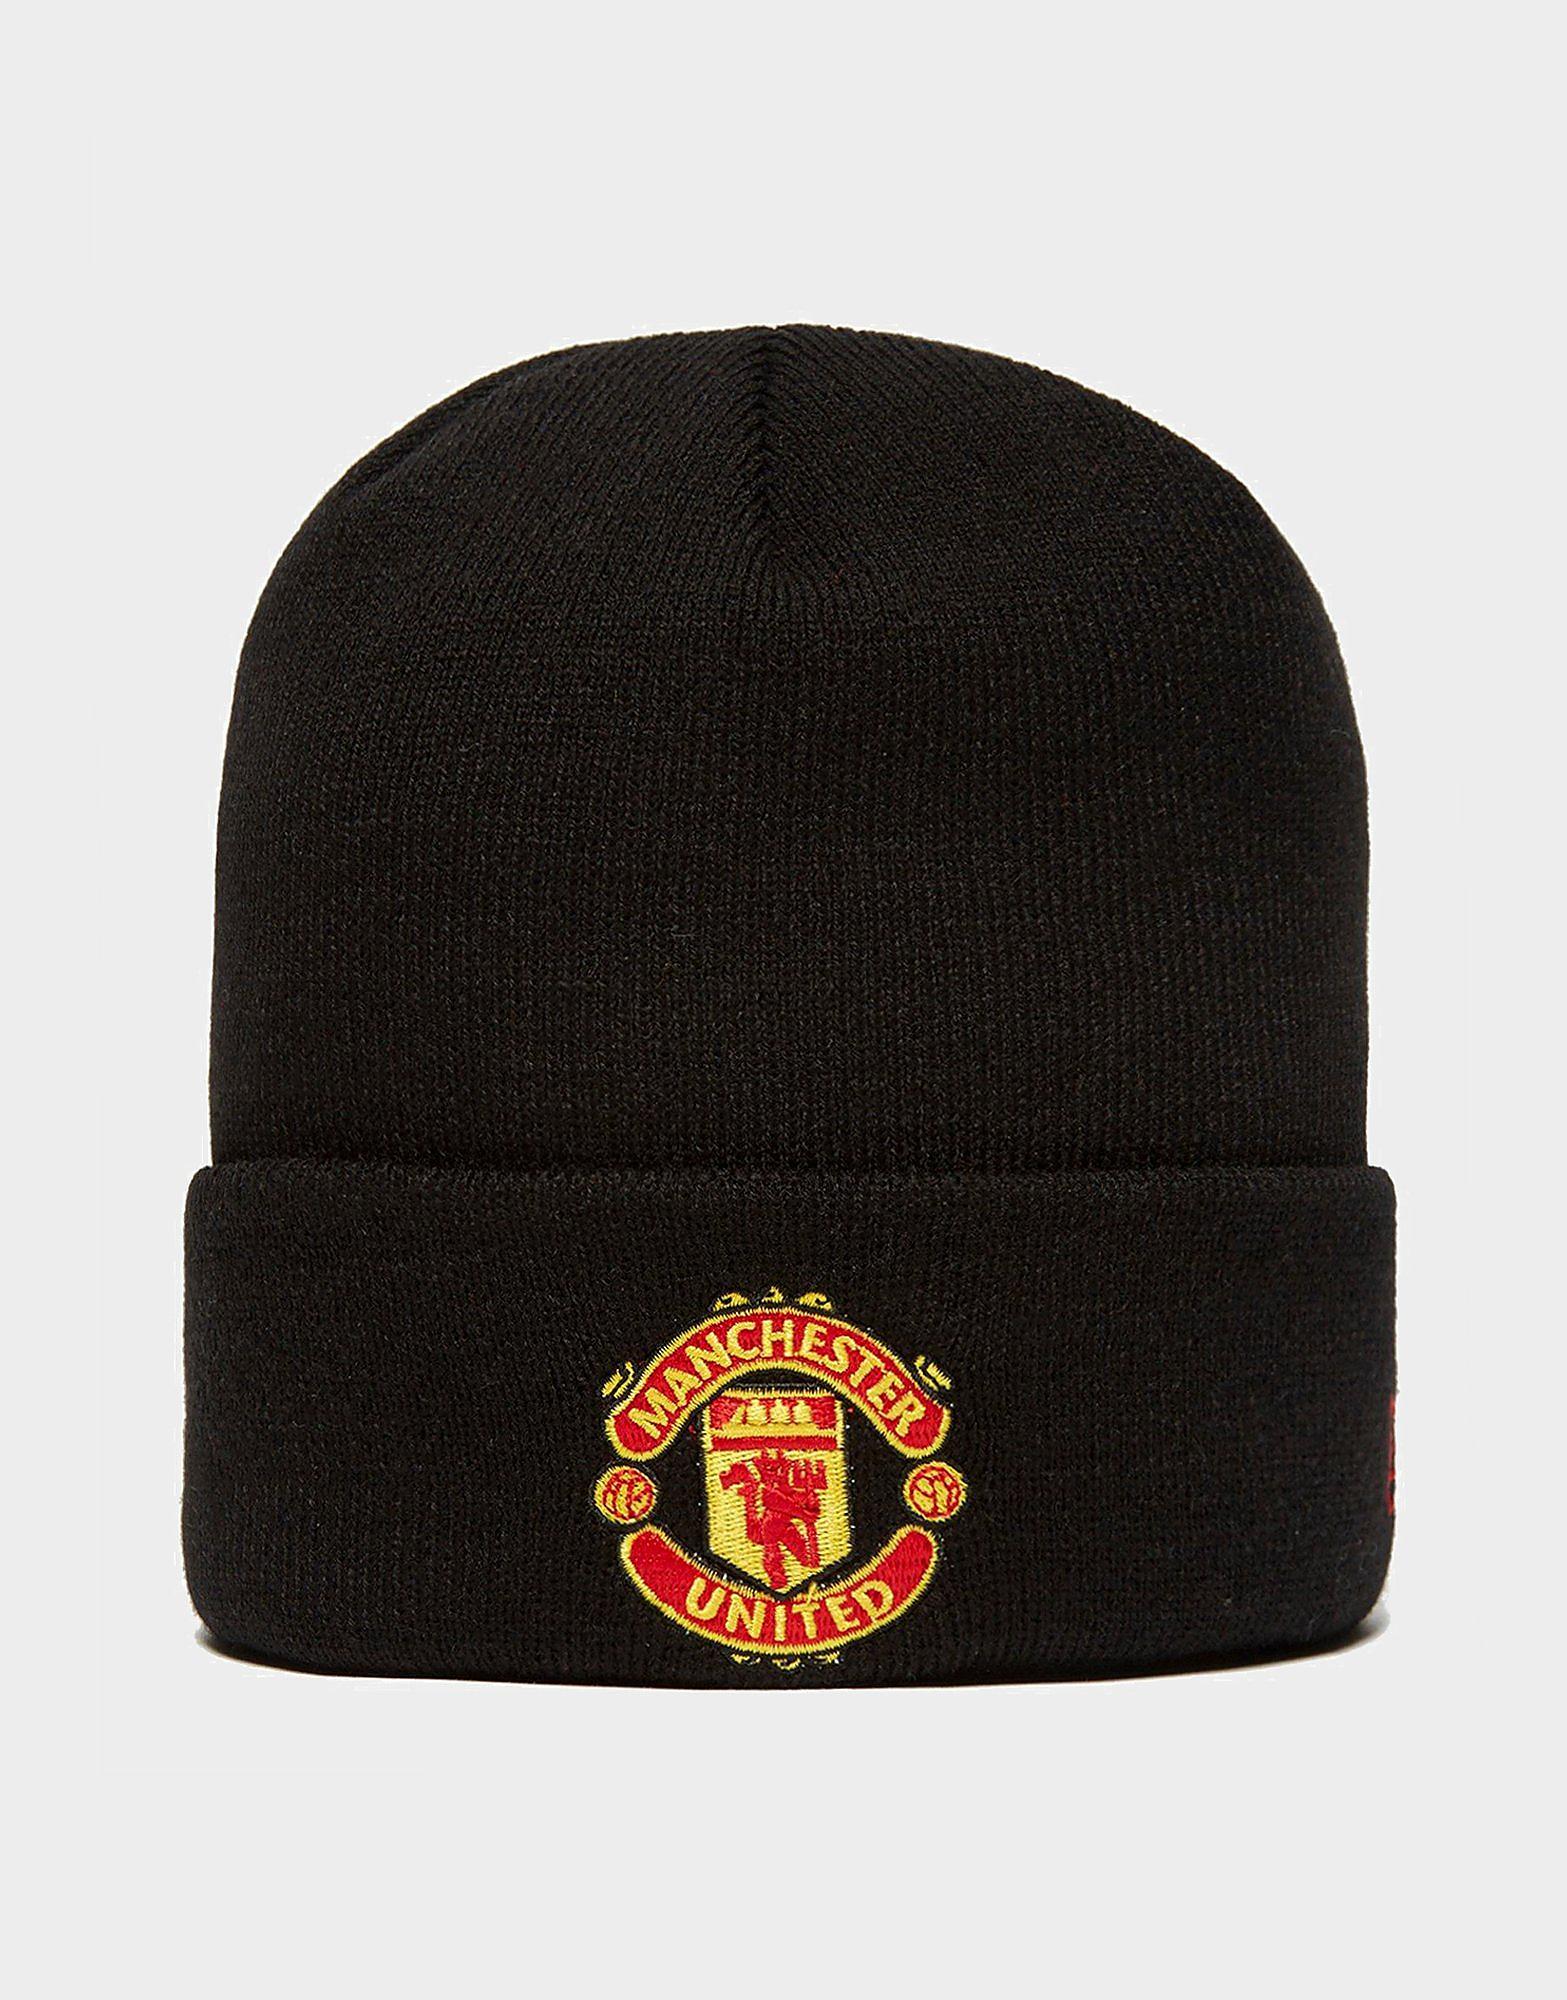 New Era Manchester United gebreide muts